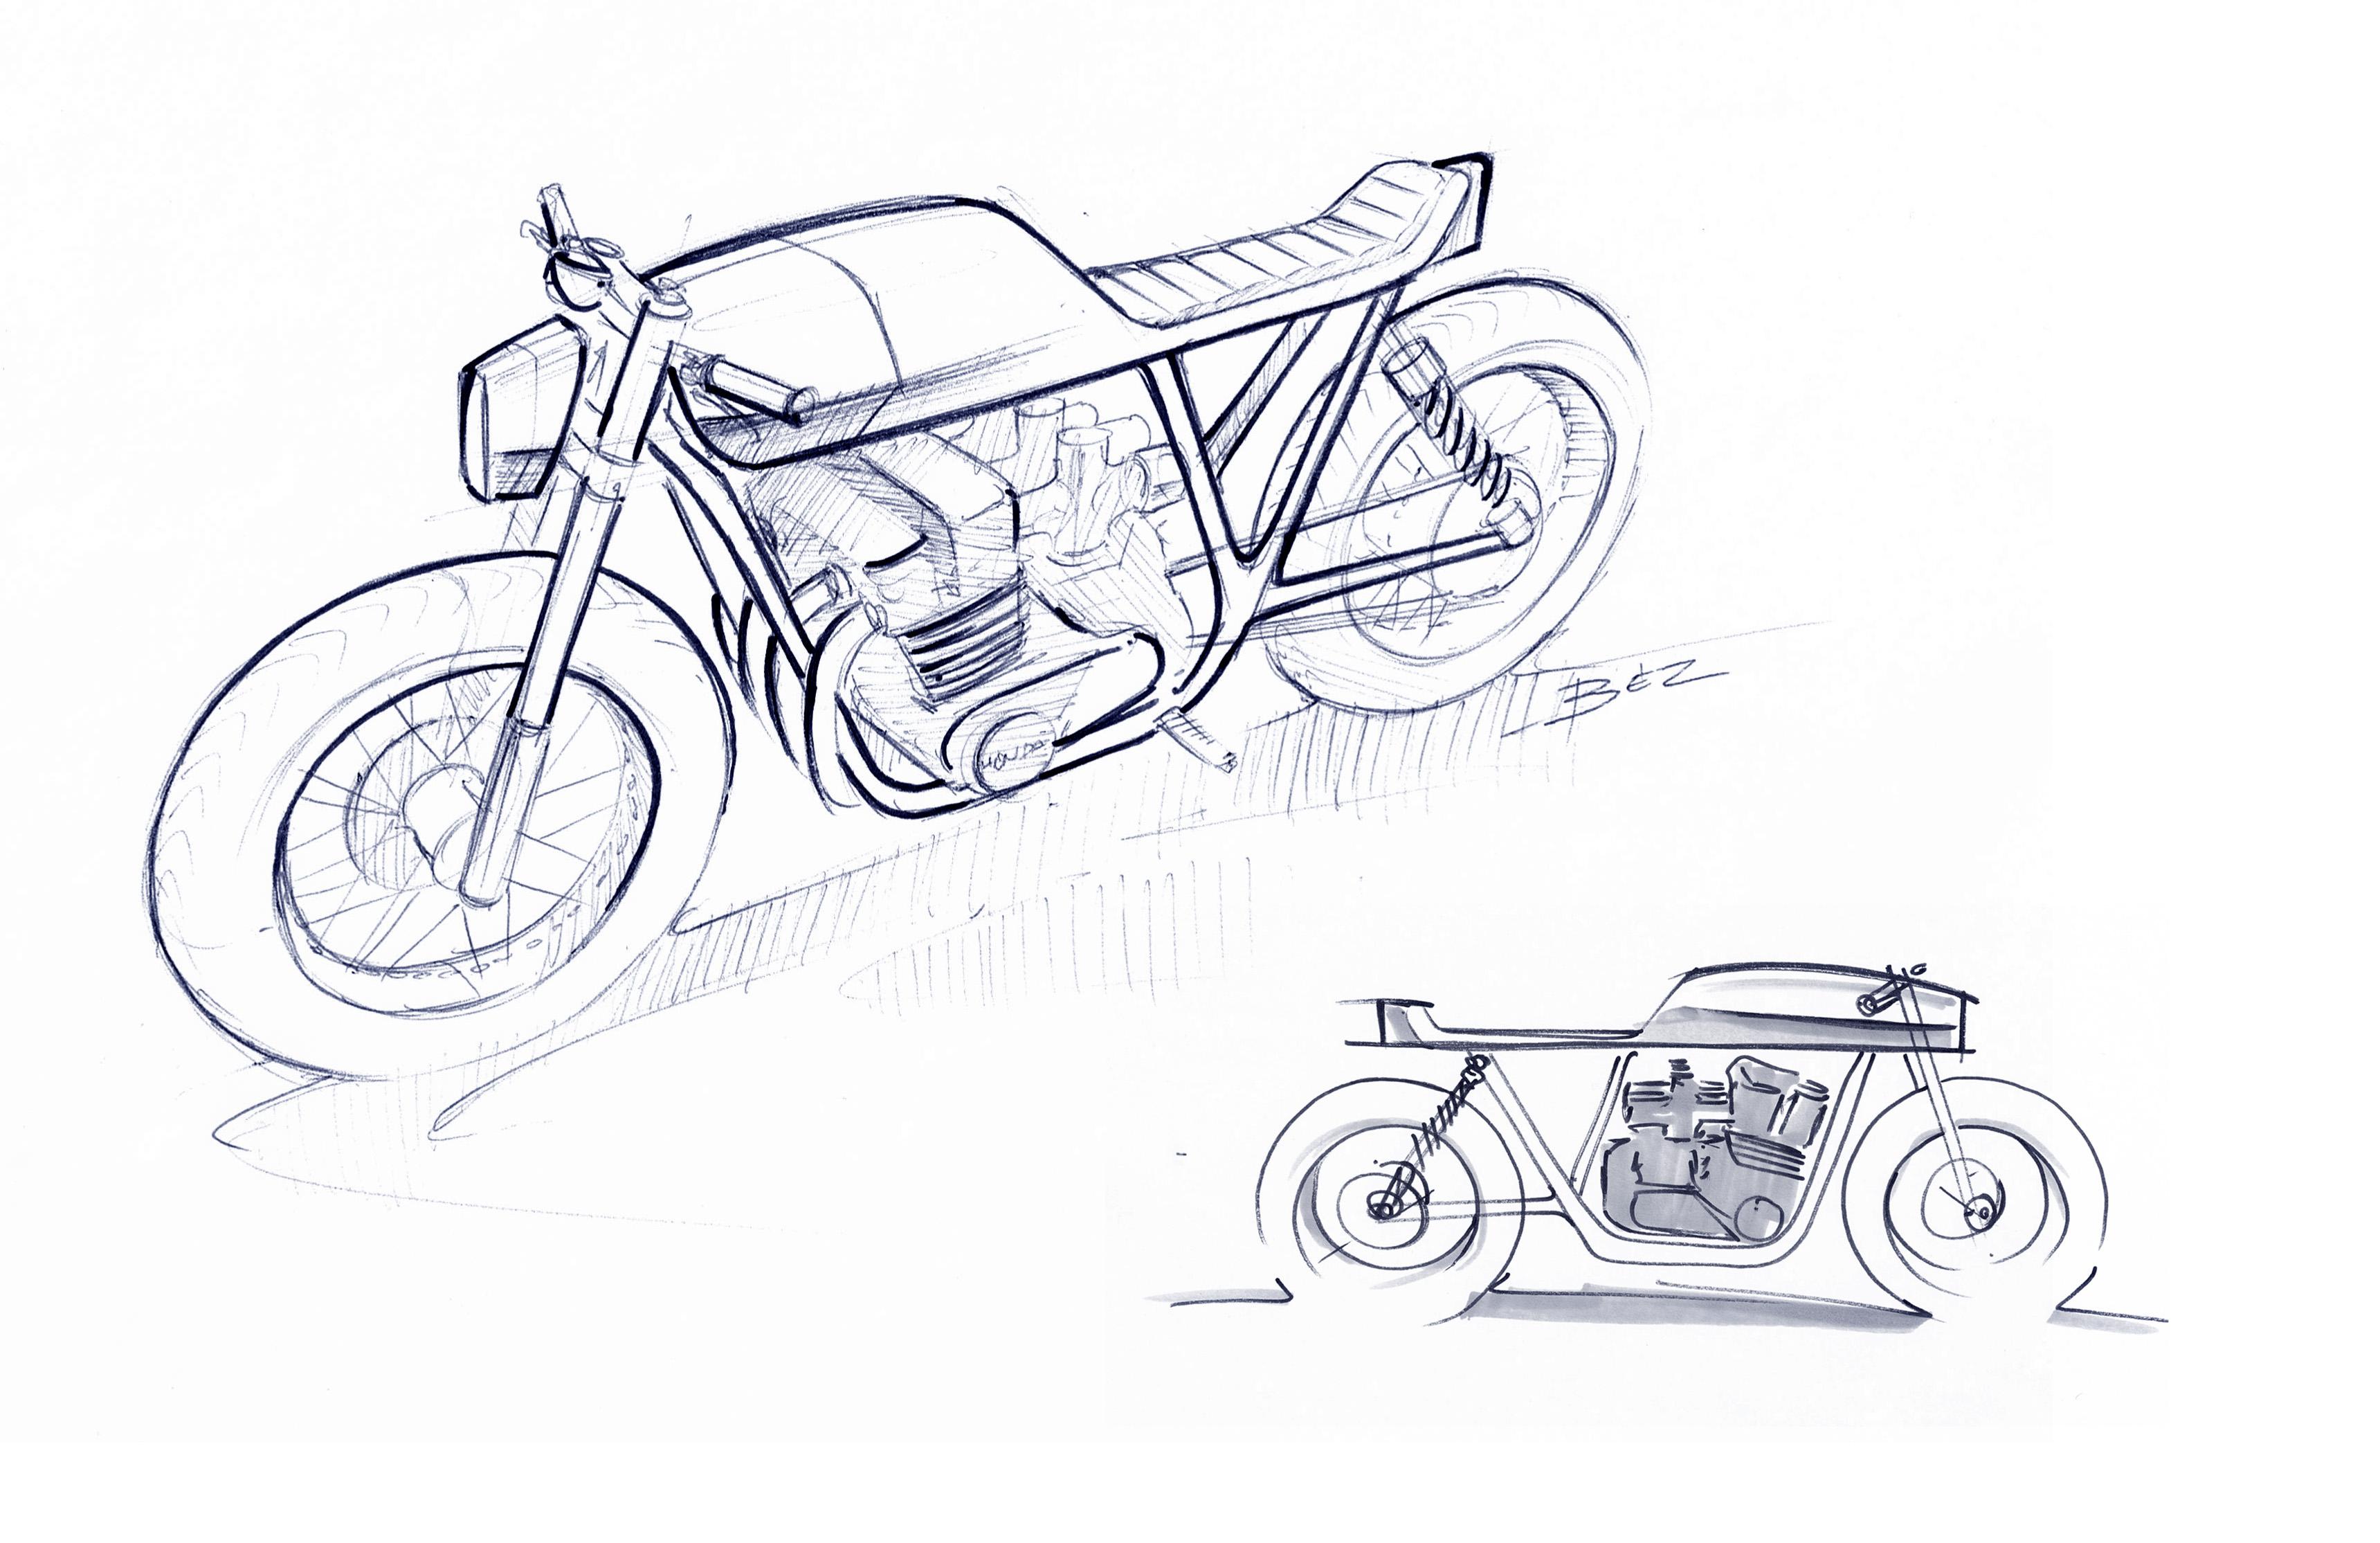 Honda - CB1100 - Sketches